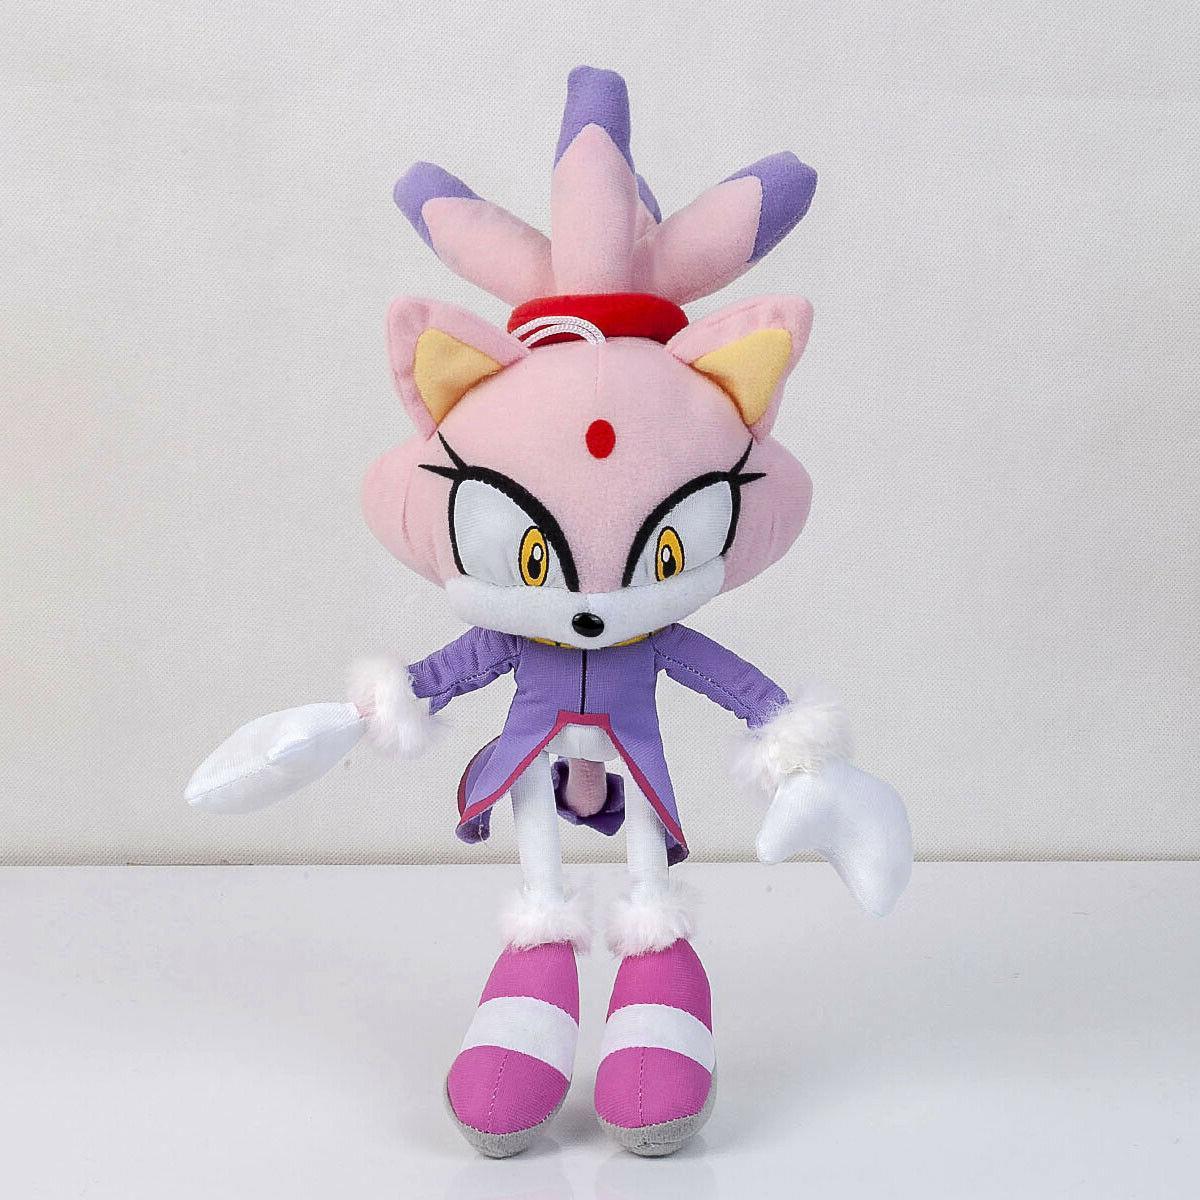 Blaze Doll Stuffed Animal Plushie Soft 13 In